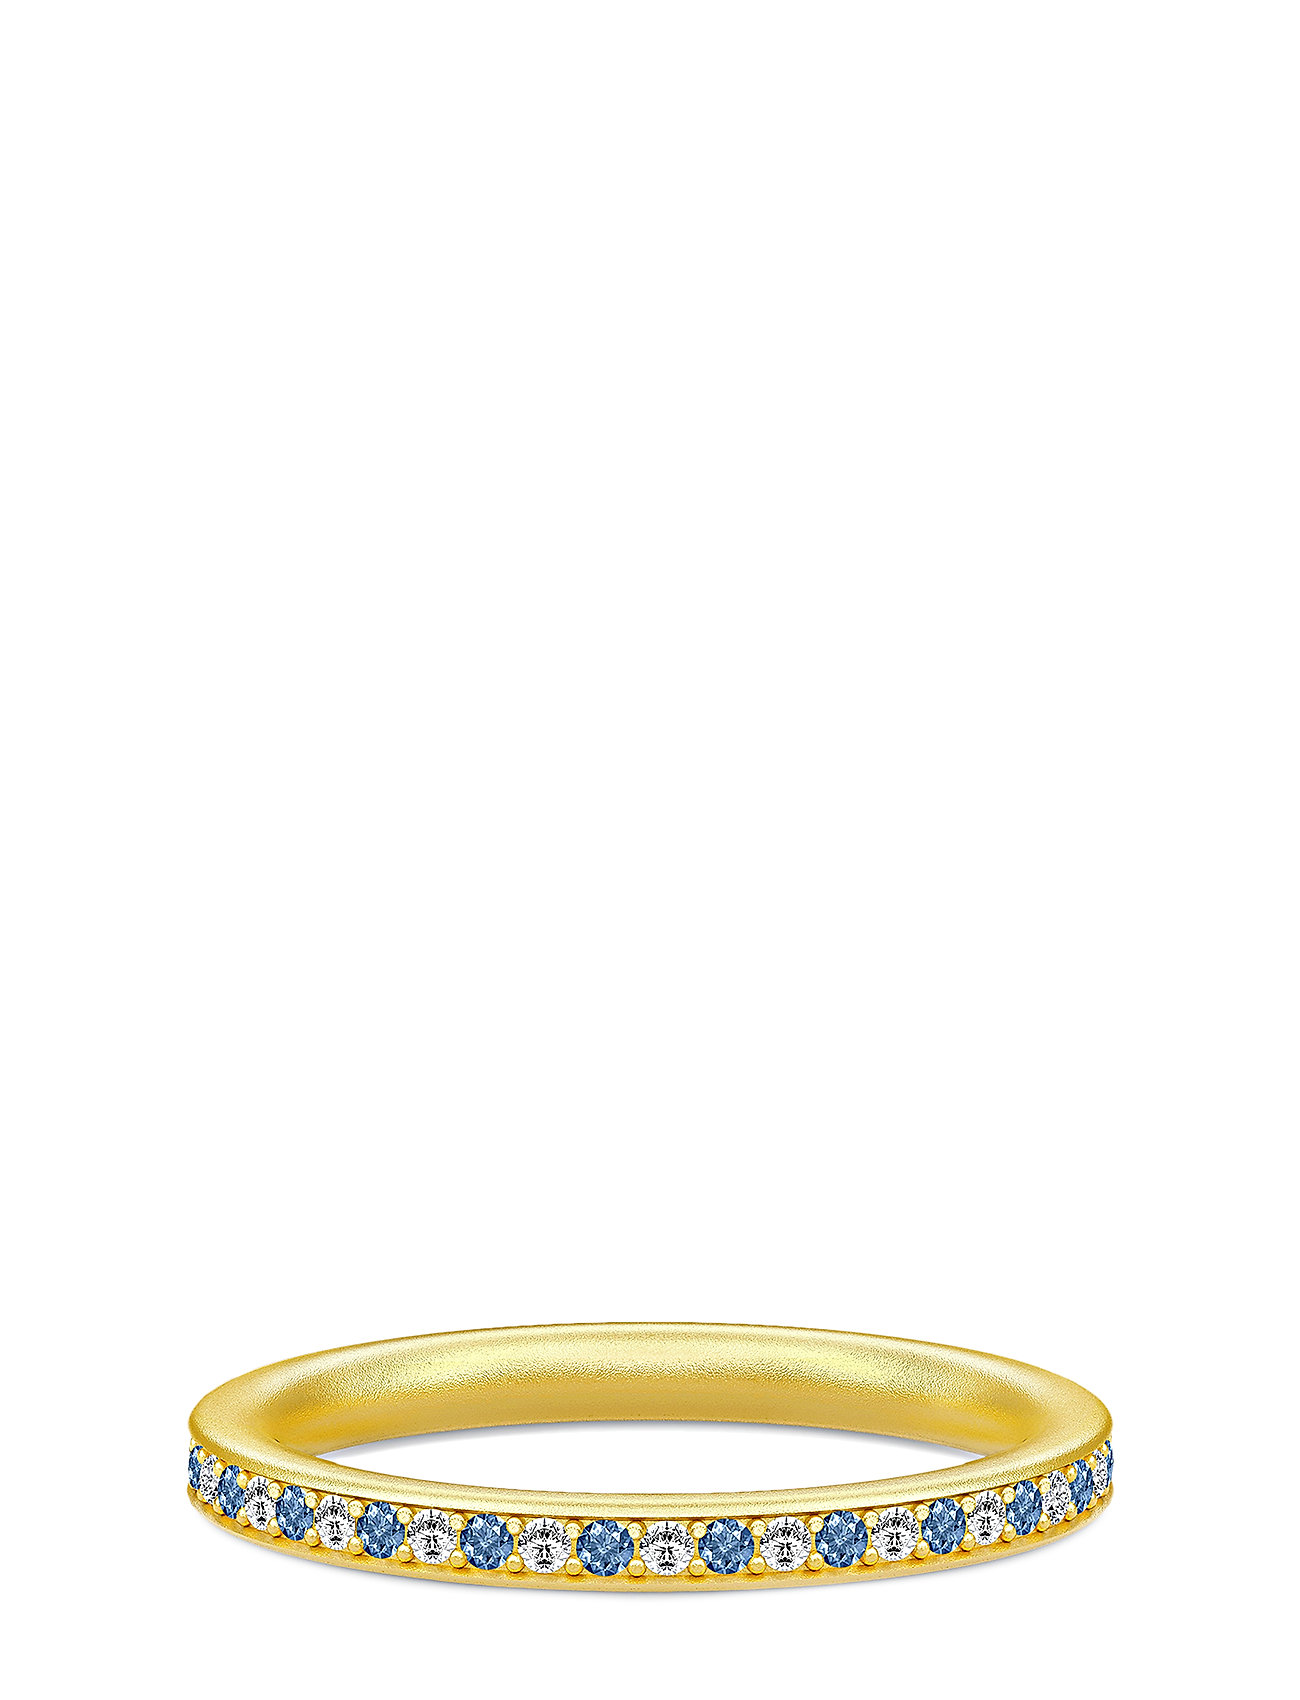 Image of Infinity Ring Gold White/Blue Ring Smykker Guld Julie Sandlau (3286392041)